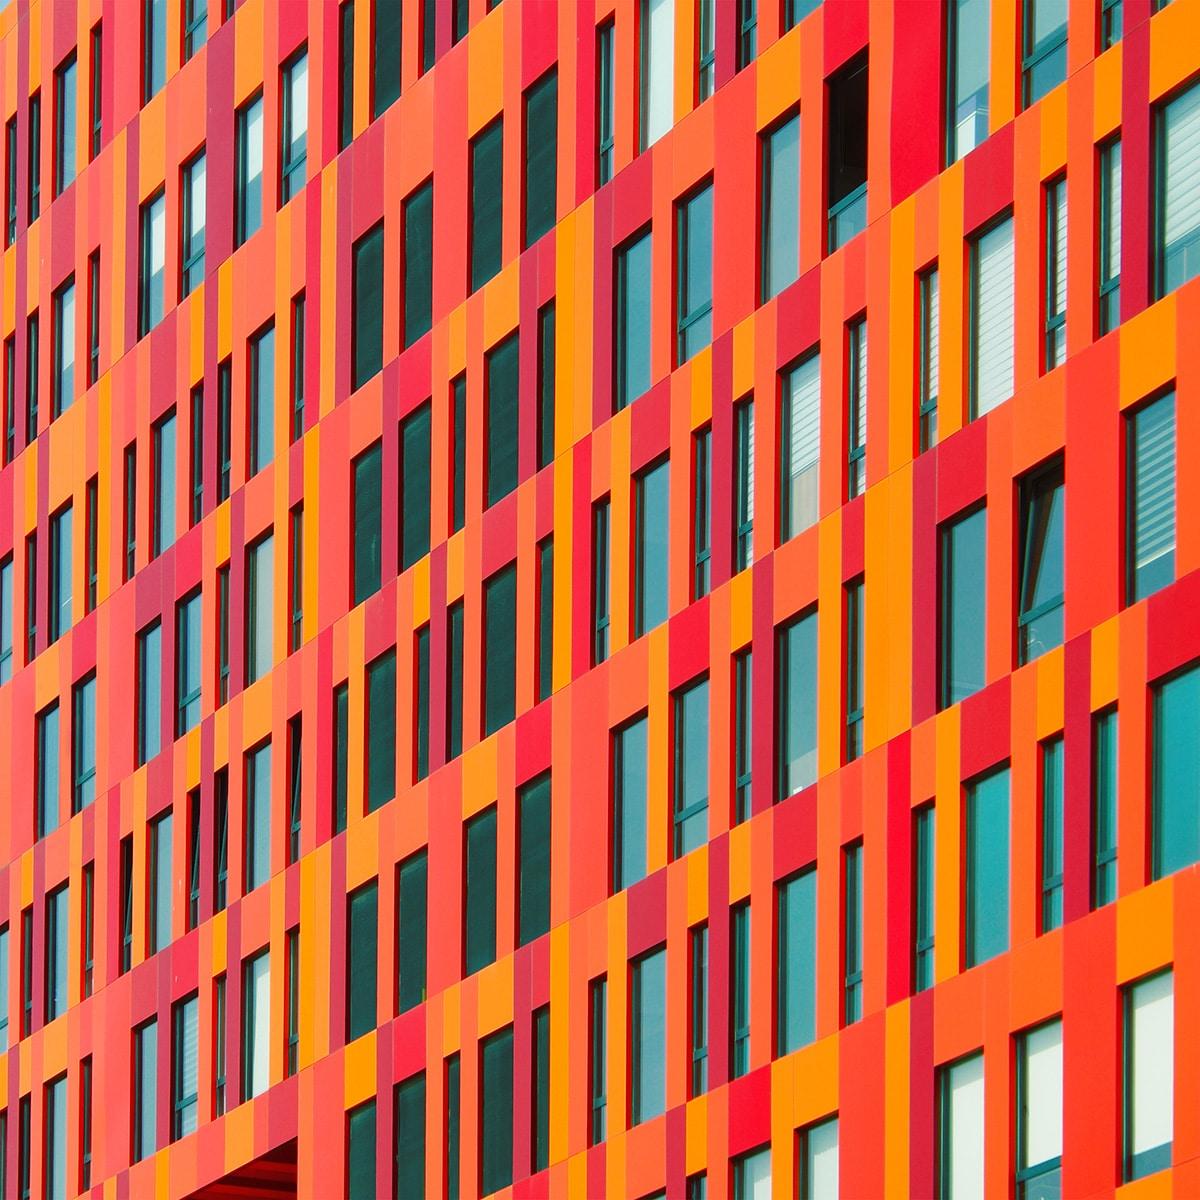 Arquitectura de colores